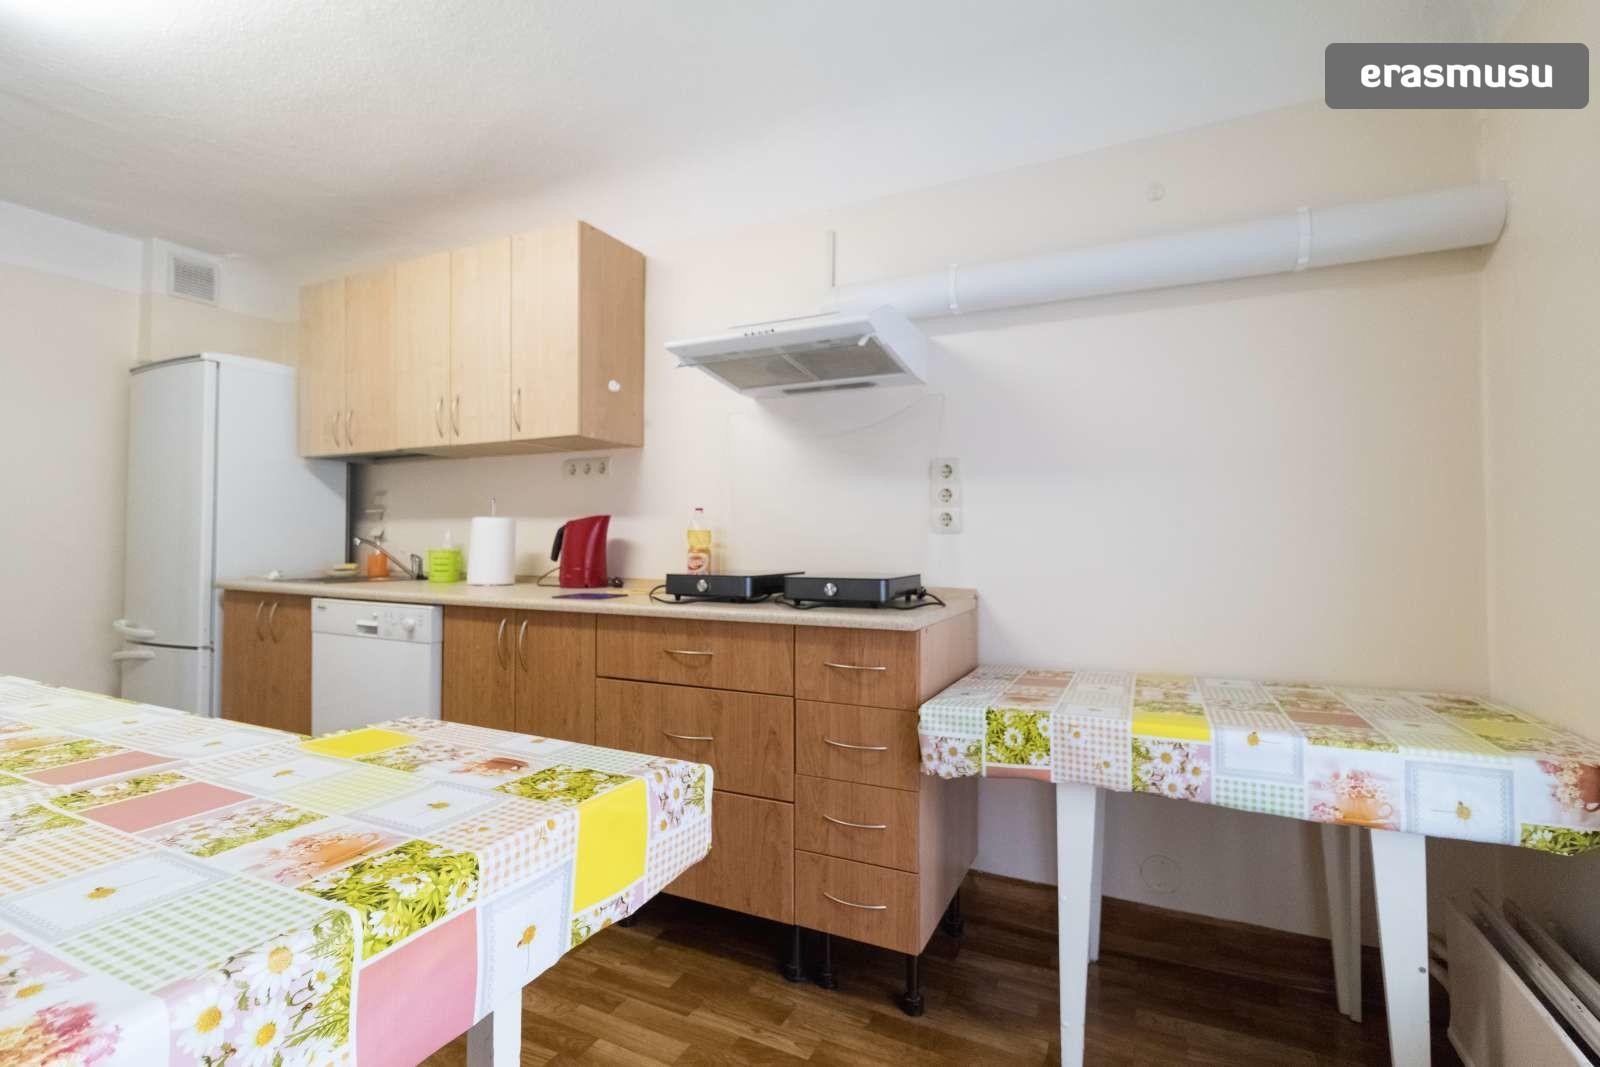 spacious-3-bedroom-apartment-rent-avoti-801fed75743ab7d5e66e141c